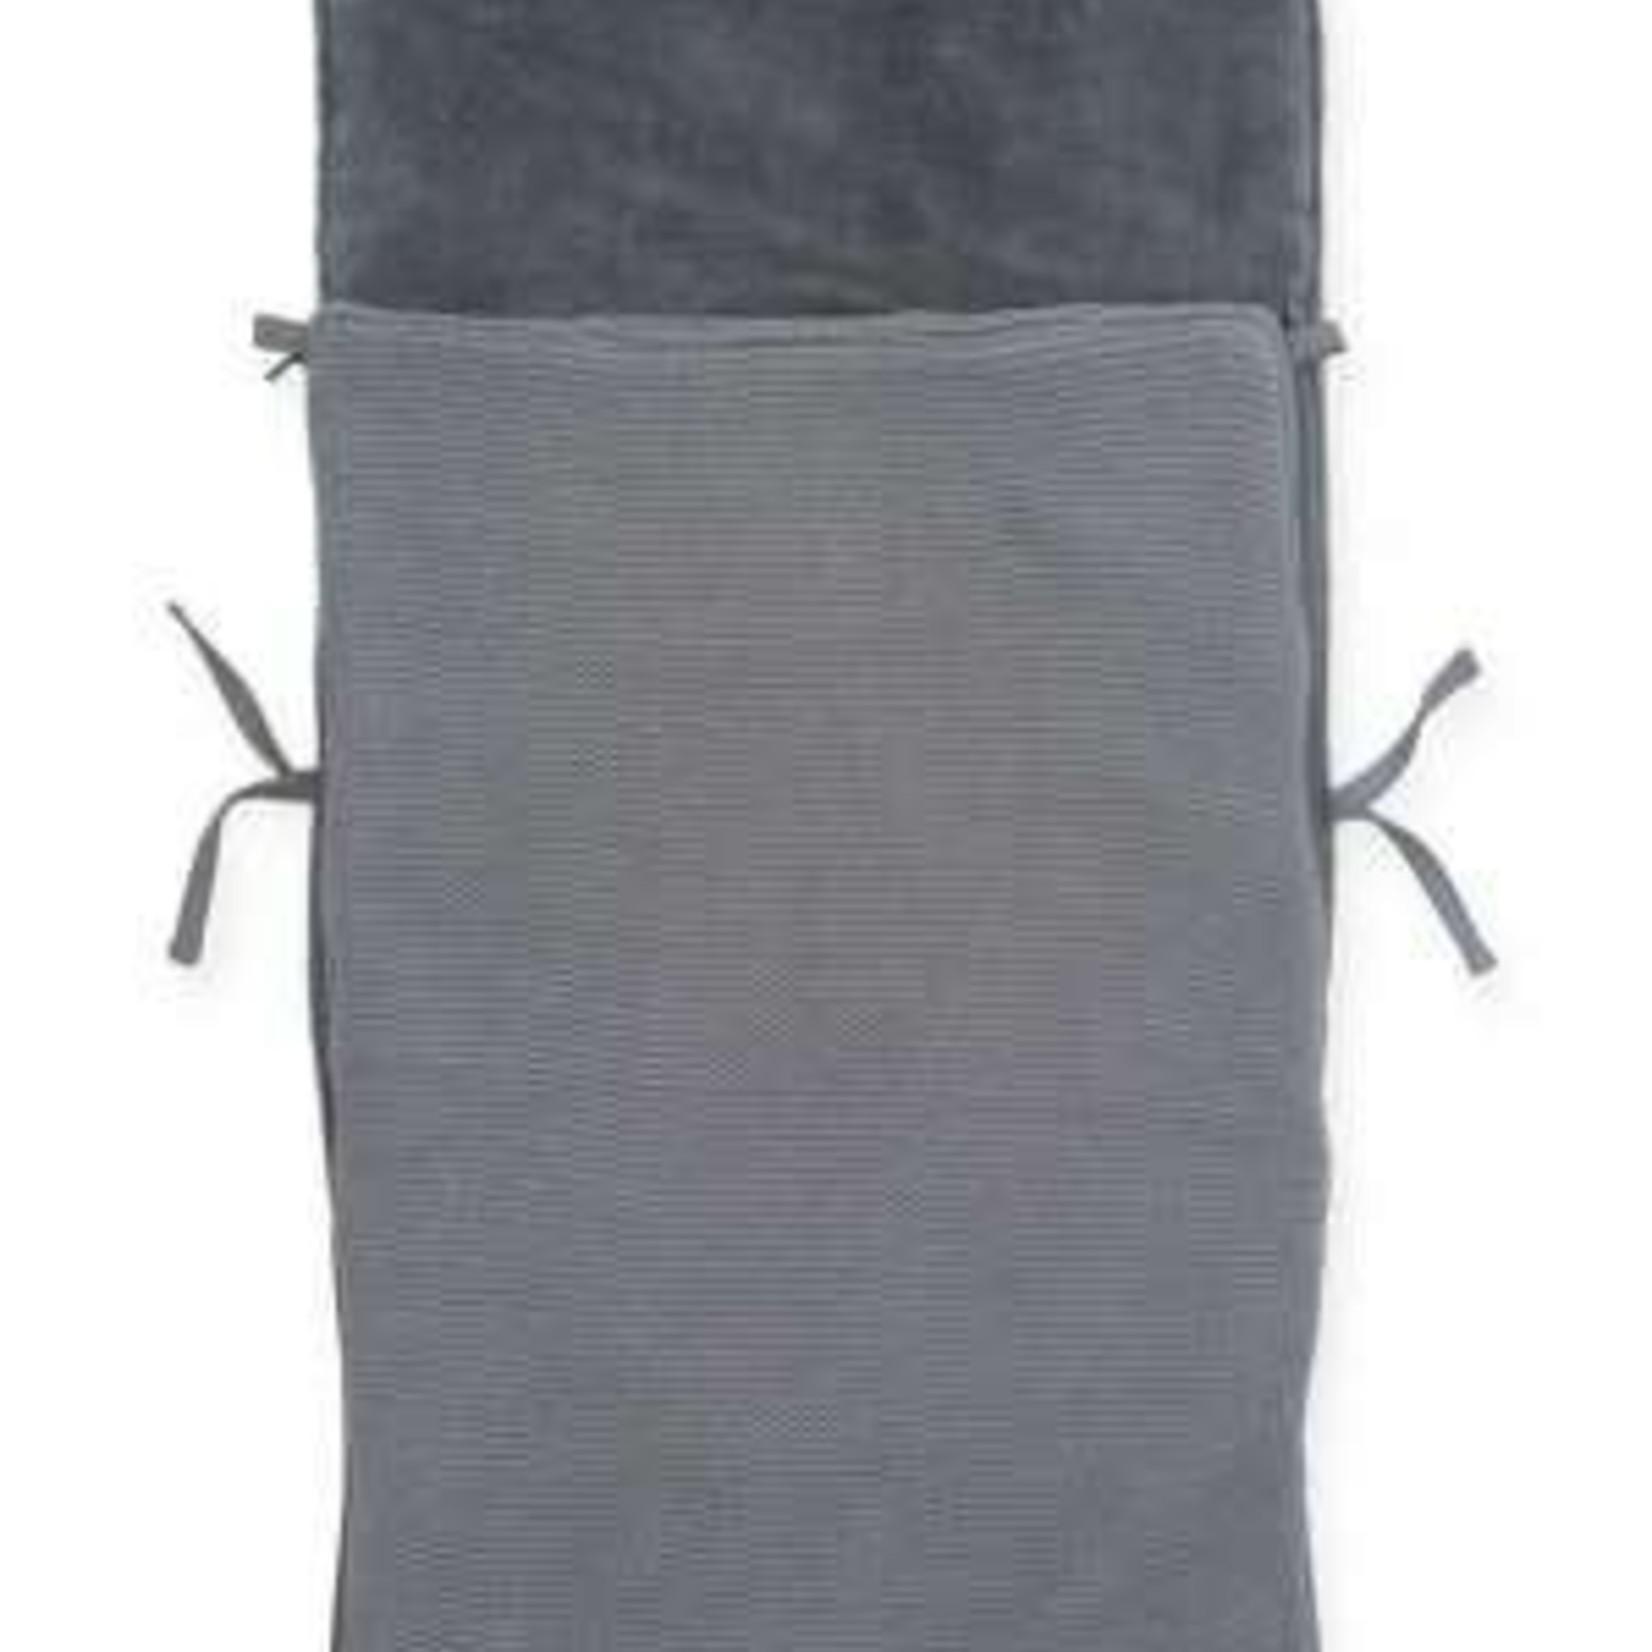 Jollein Jollein Voetenzak Maxi-cosi Basic knit Stone grey